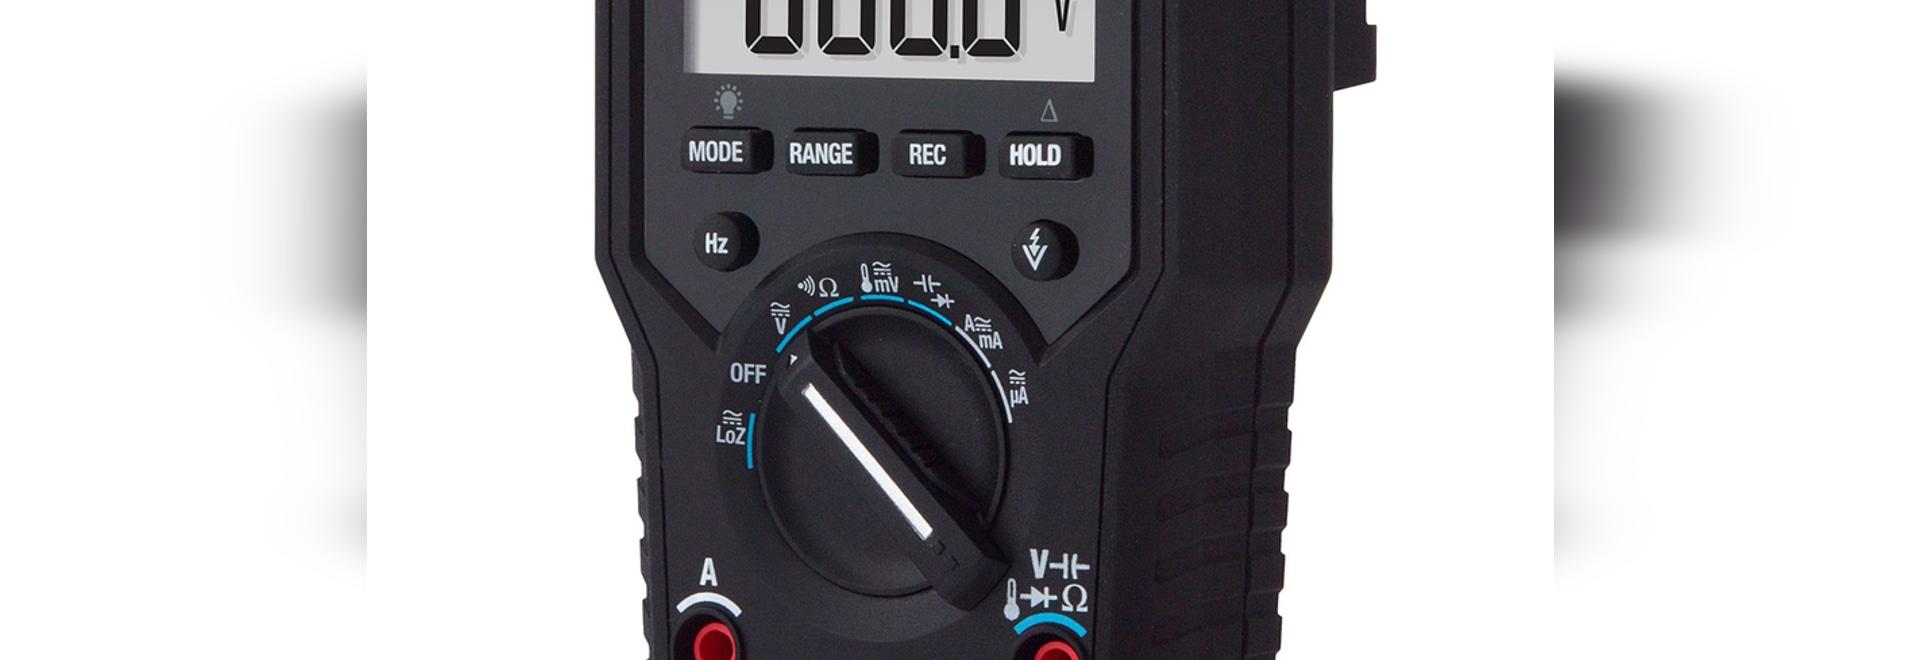 True-RMS Multimeter Includes VFD Mode